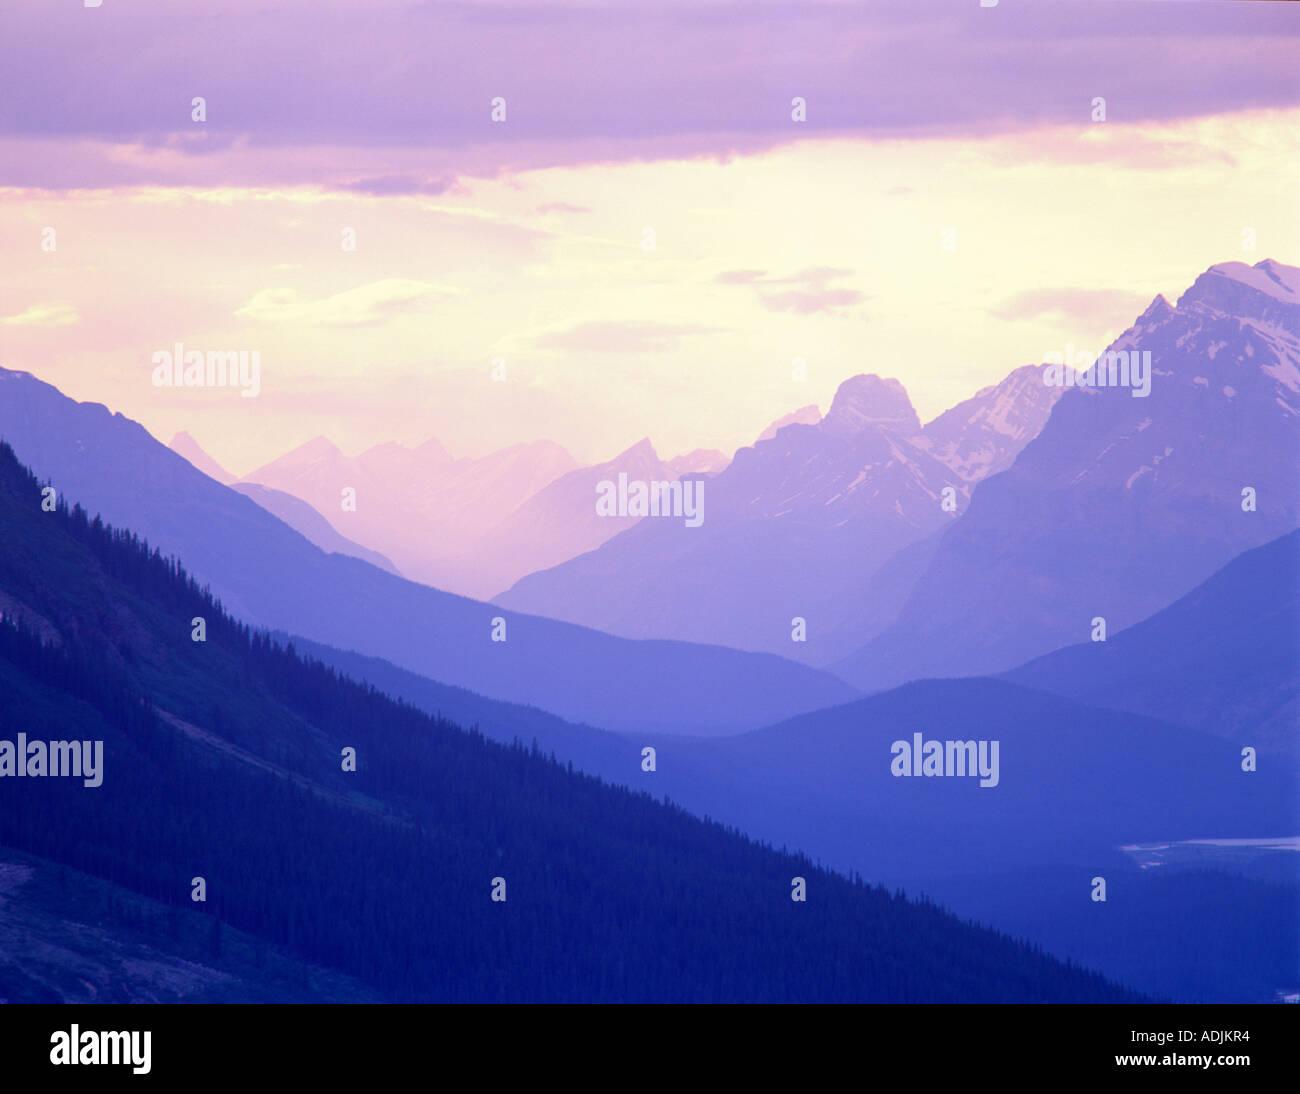 Berge in der Nähe von Peyto Lake-Banff Nationalpark, Kanada Stockbild